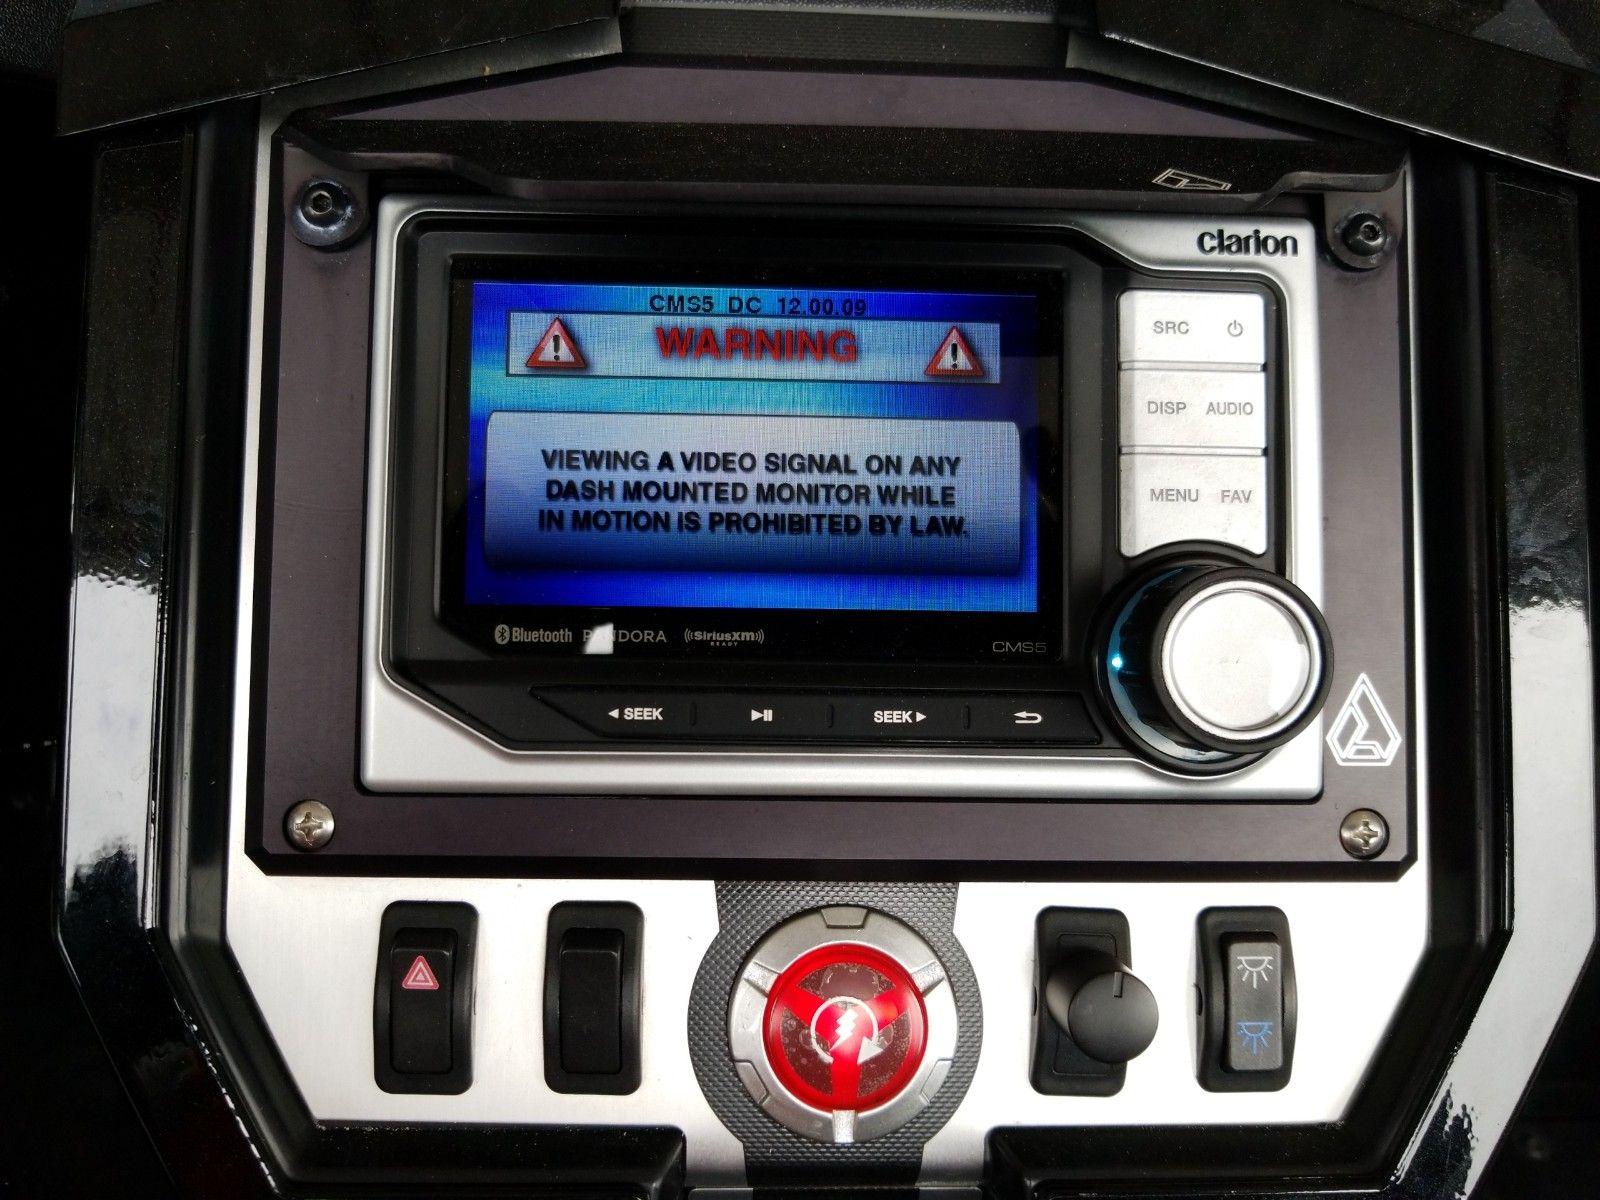 2017 POLARIS SLINGSHOT - Used Car Auction - Car Export